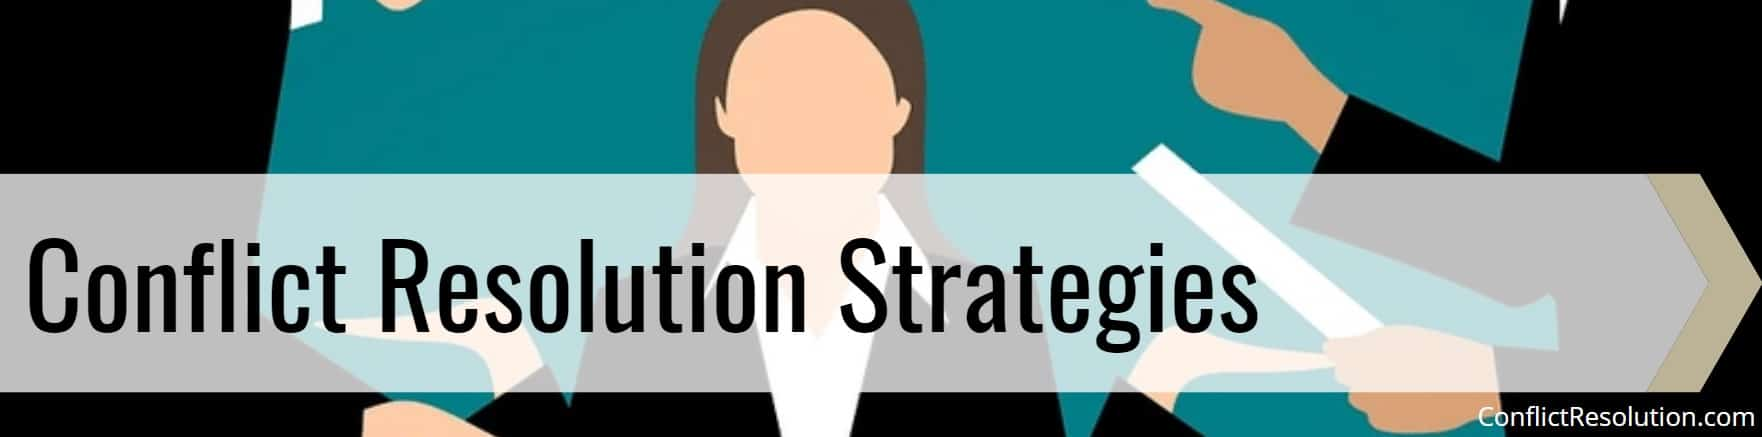 Conflict Resolution Strategies Banner